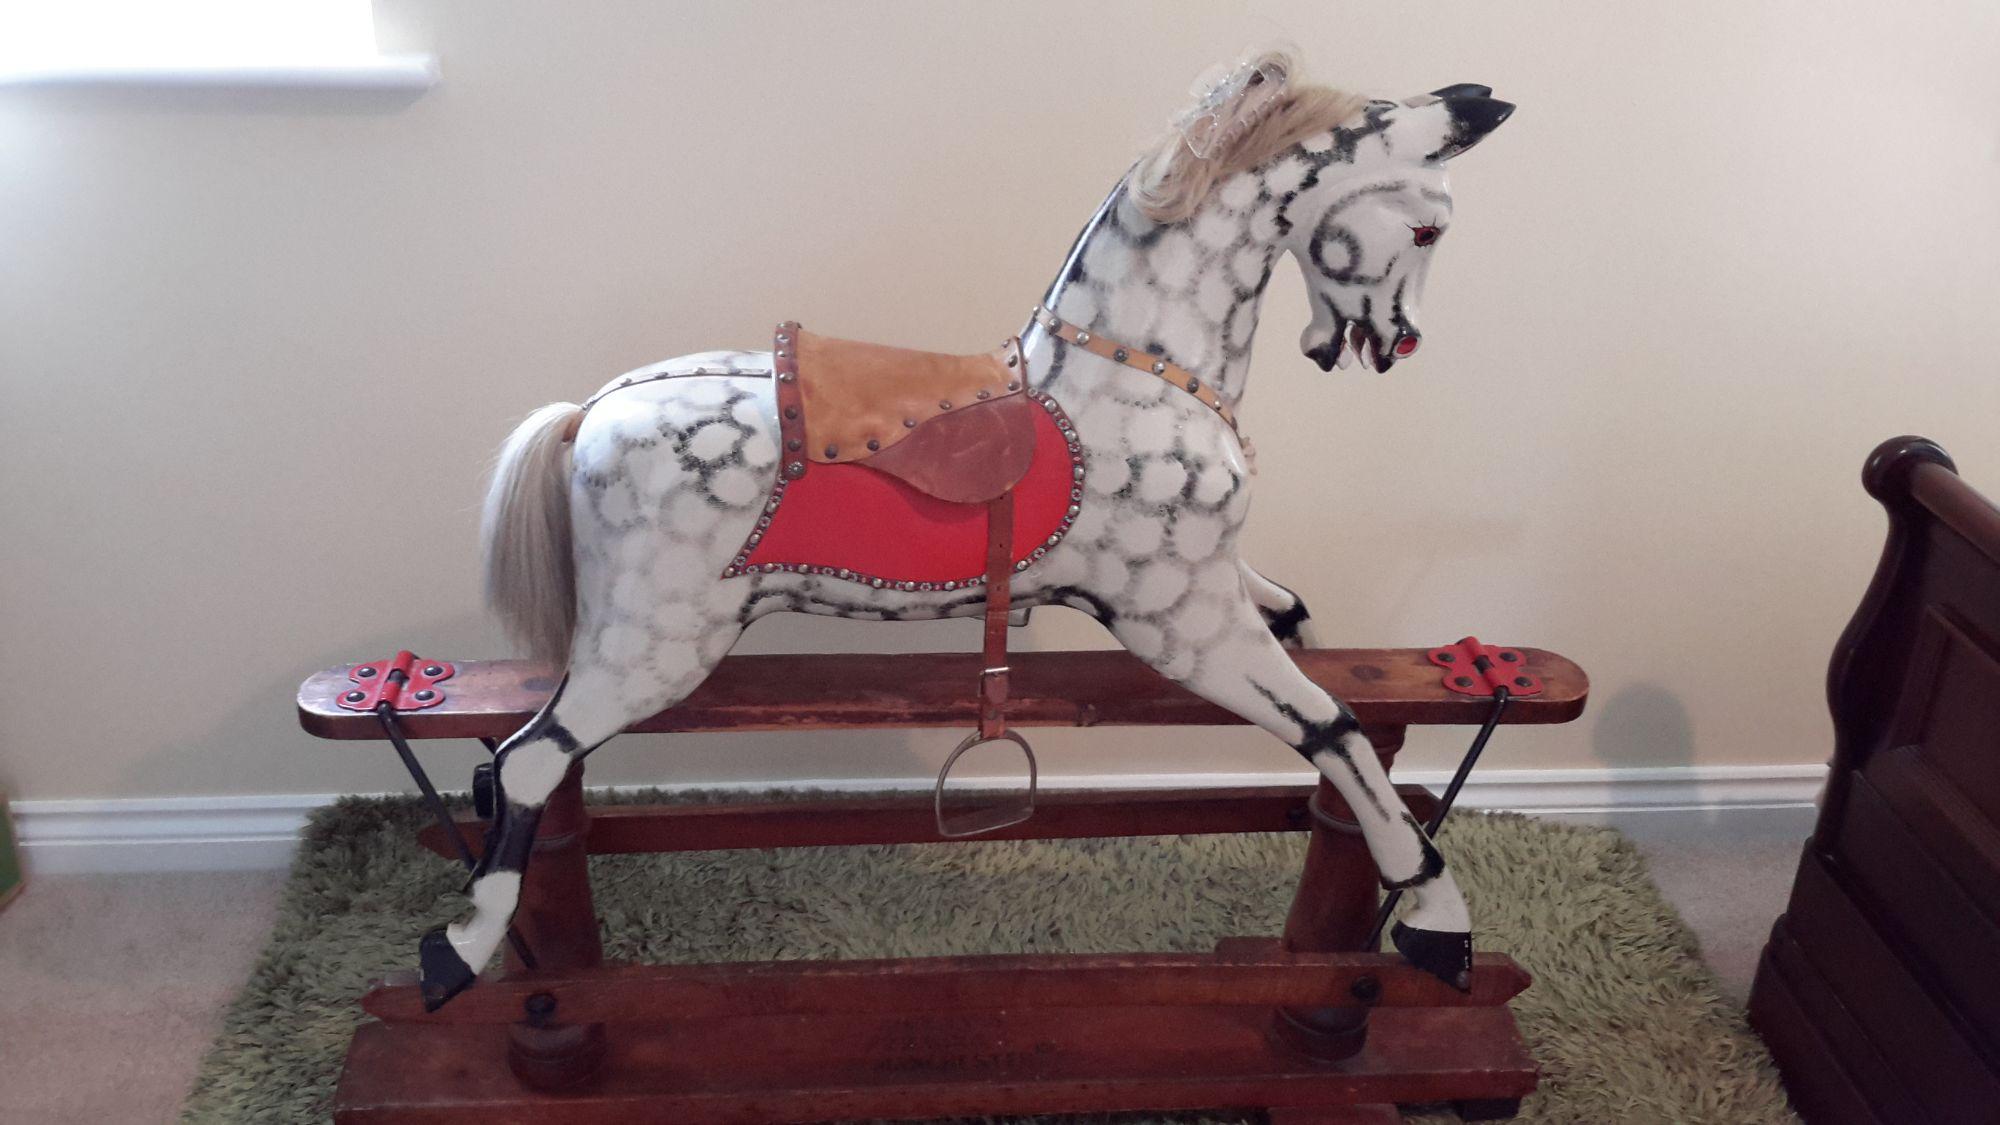 For Sale - F H Ayres antique rocking horse Henry